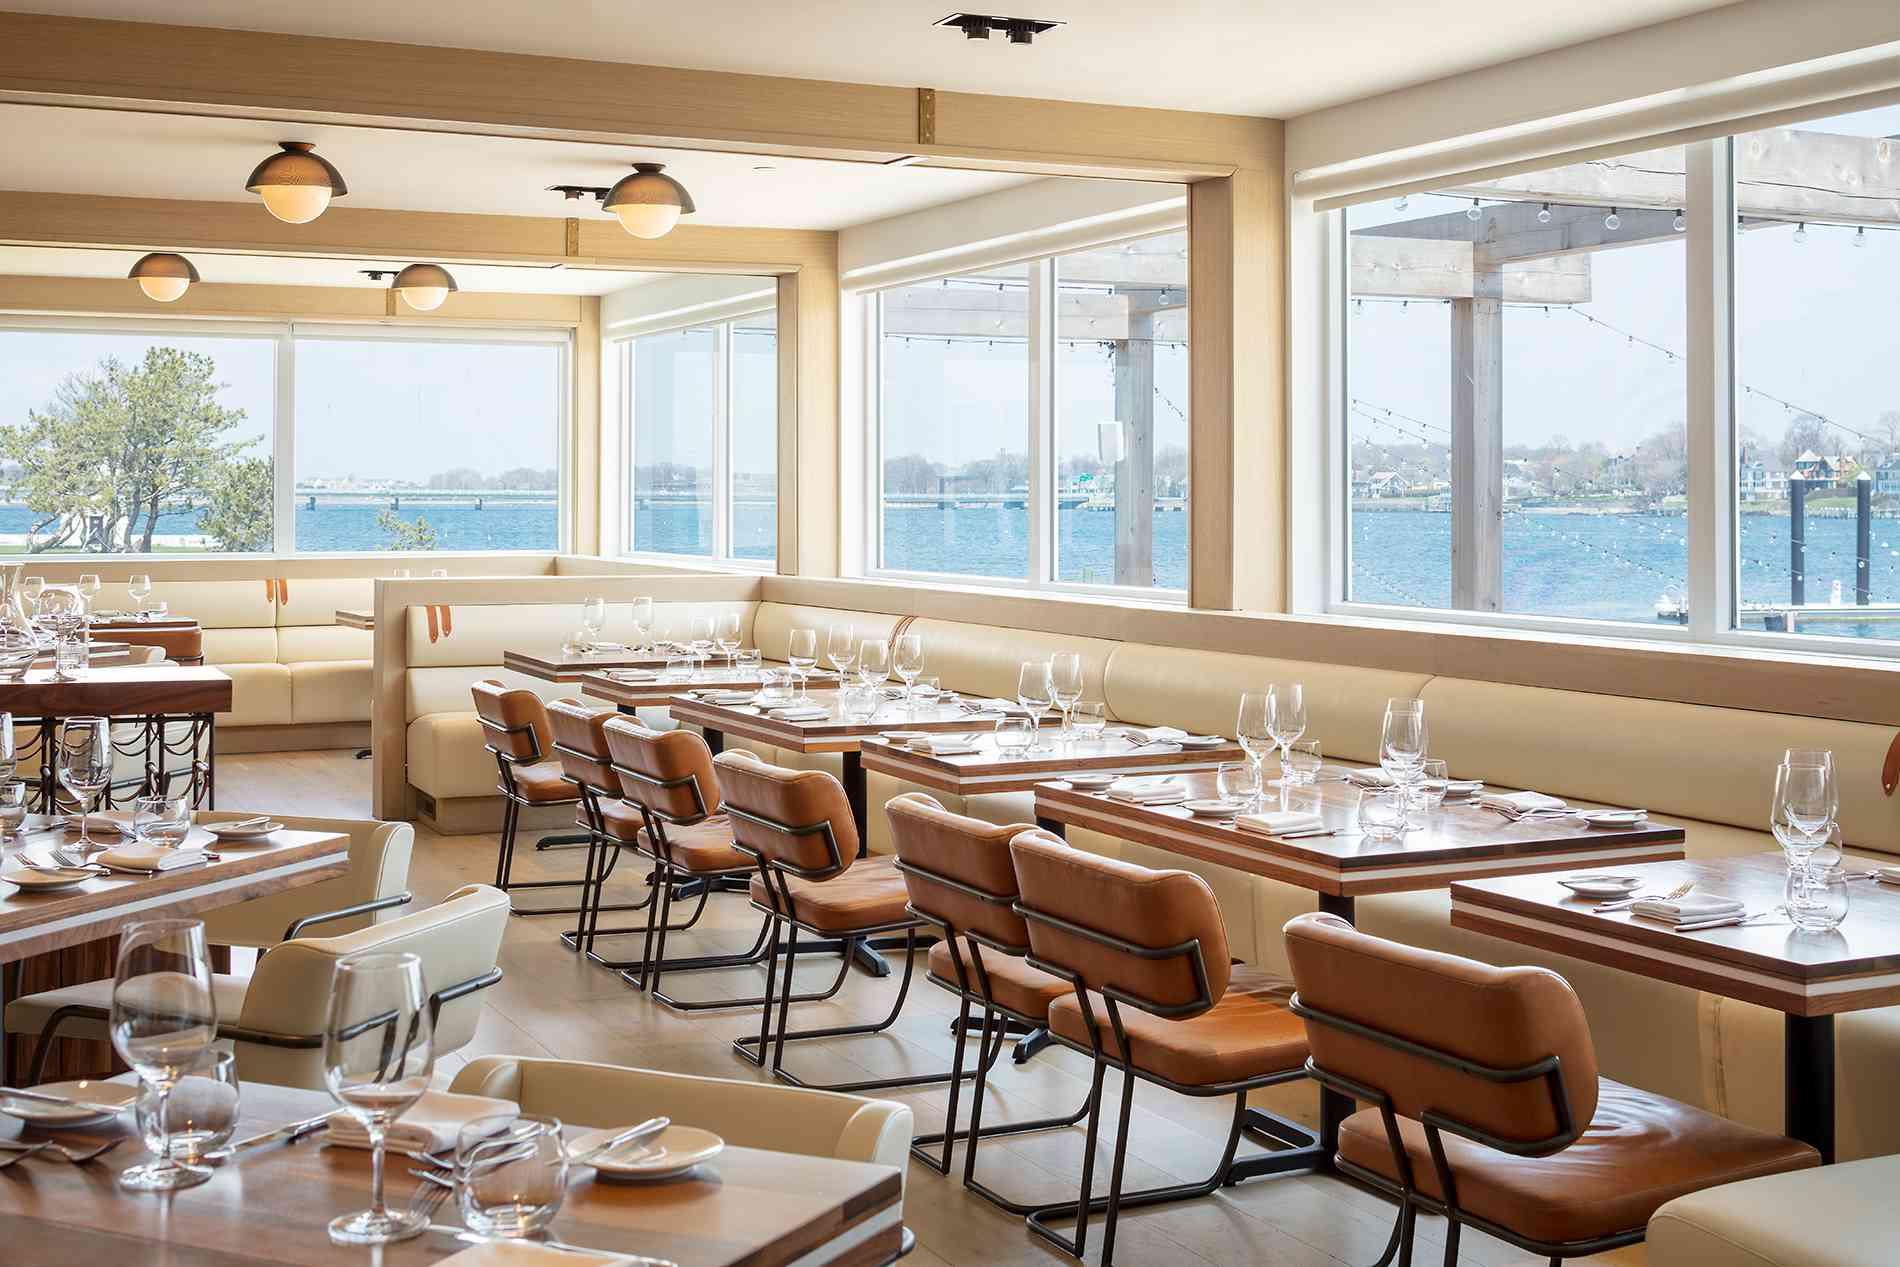 The Best Italian Restaurants In Rhode Island